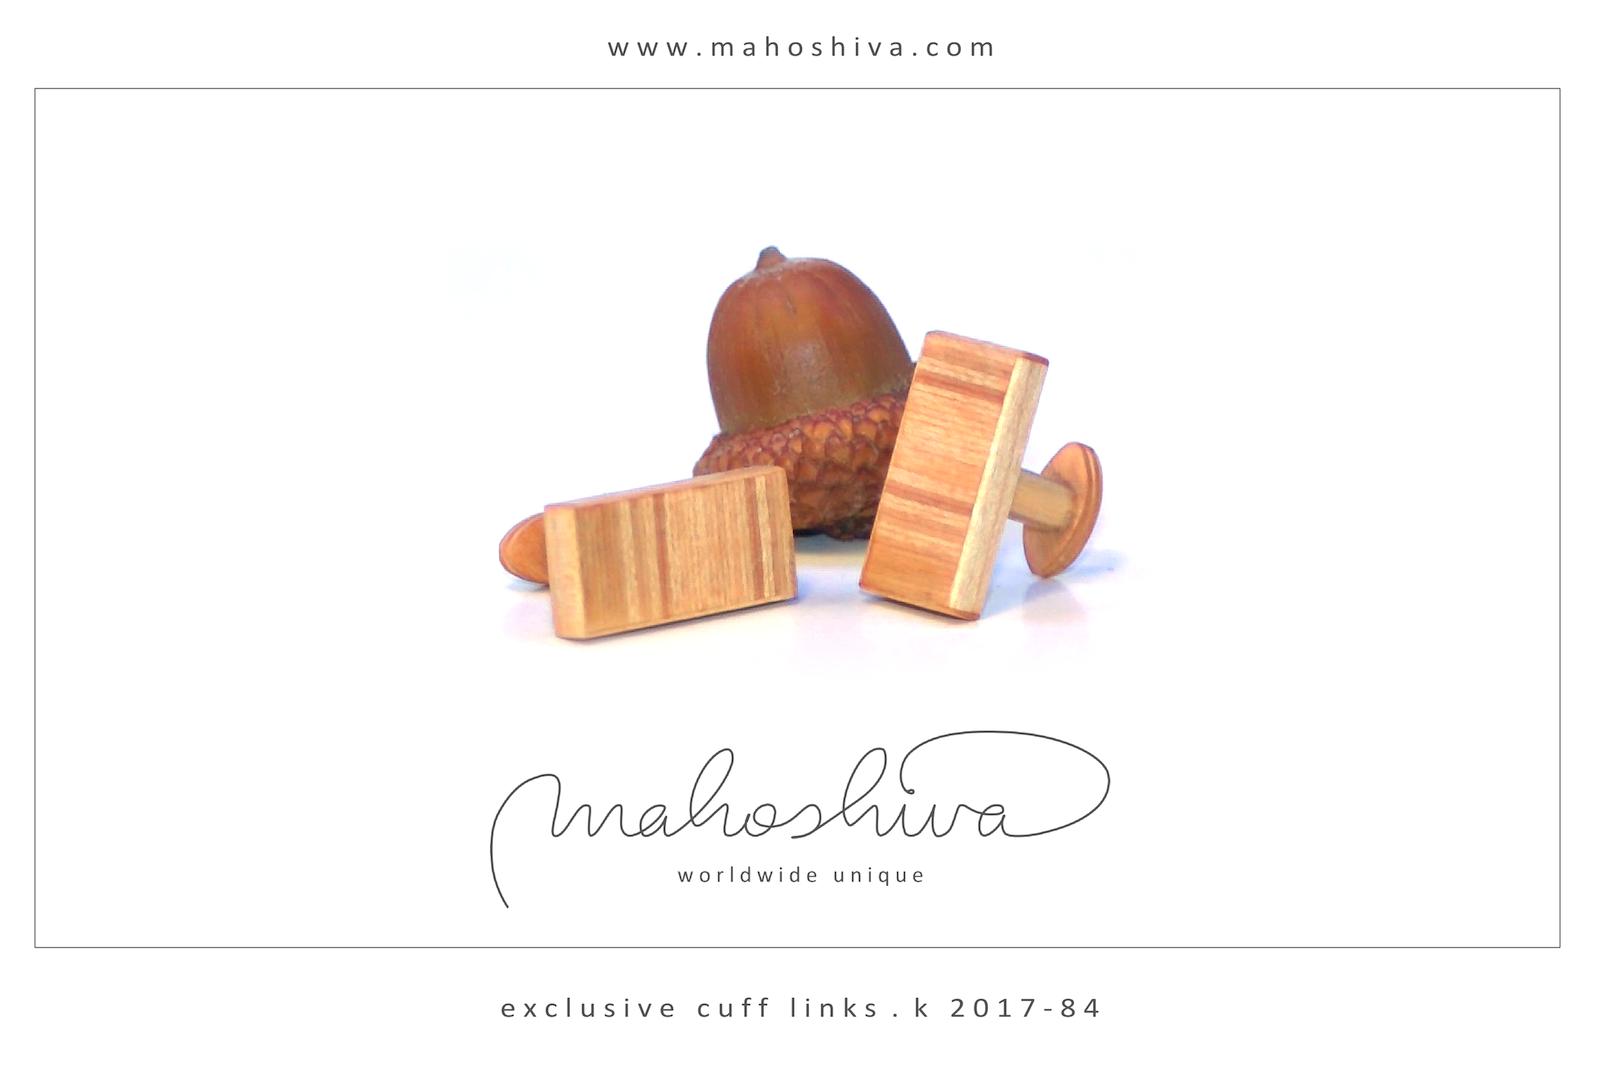 mahoshiva k 2017-84 Manschettenknöpfe aus Holz